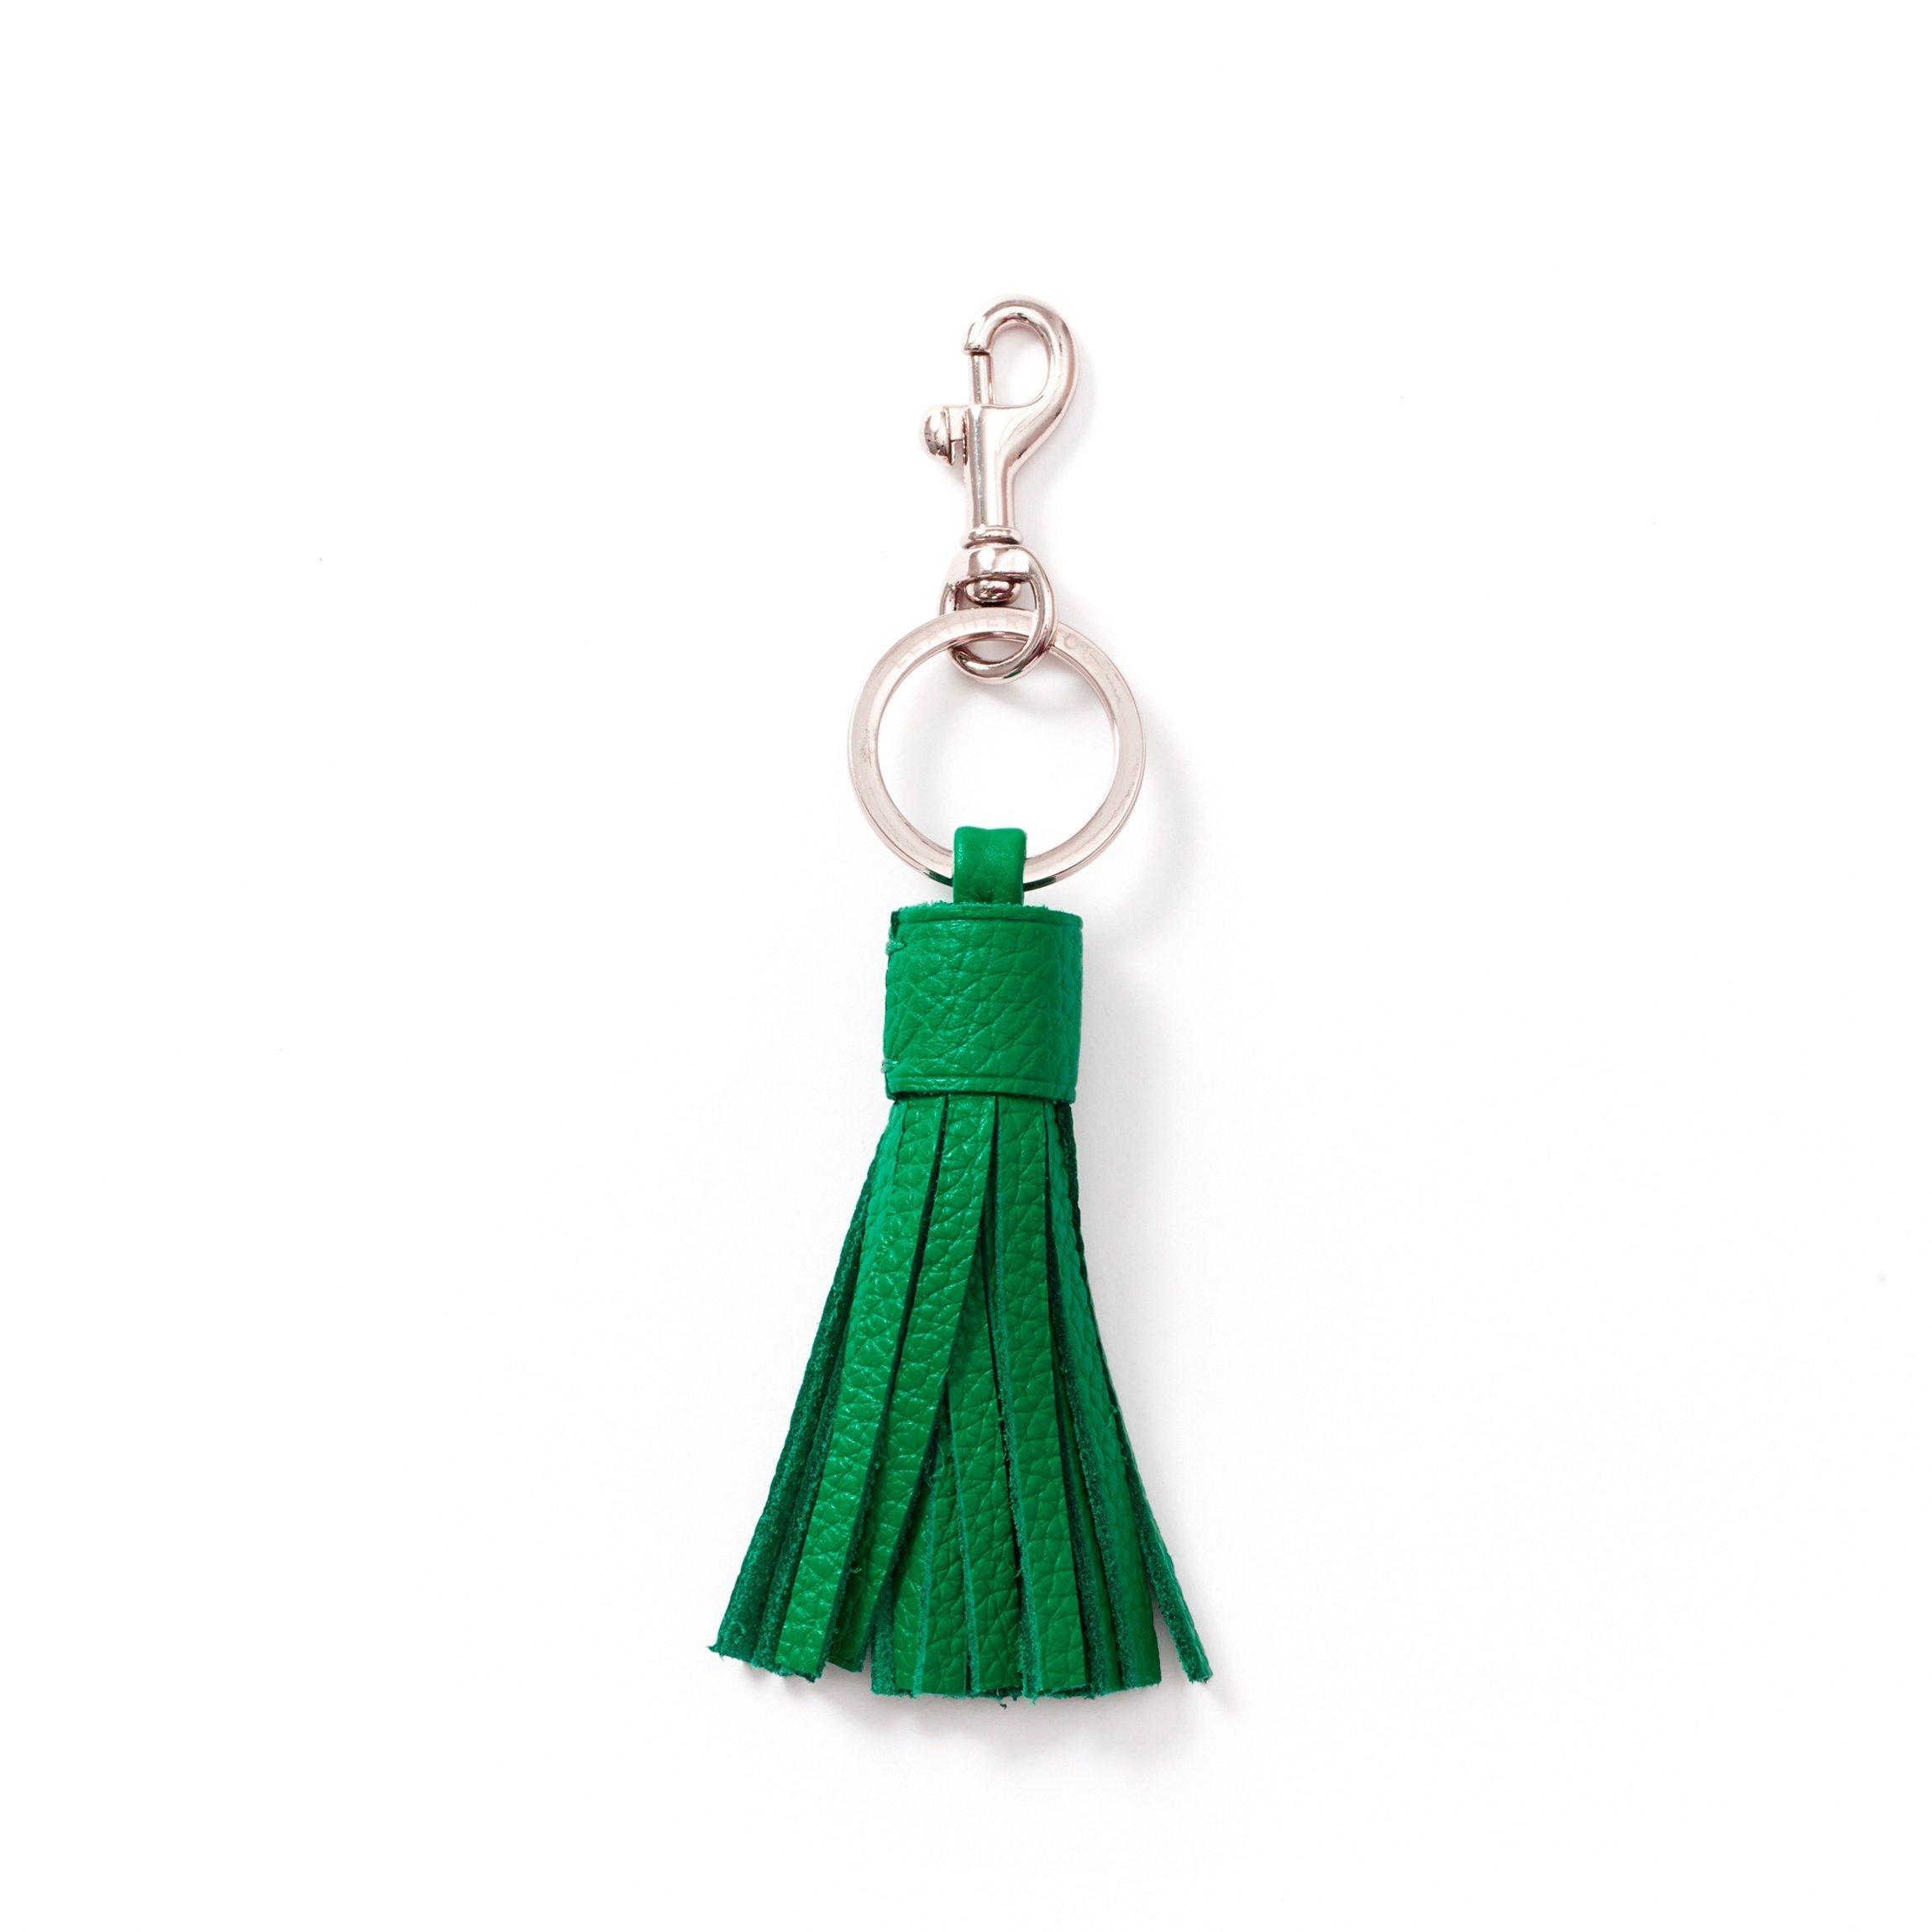 Tassel Key Chain - Full Grain Leather - Kelly Green (green)